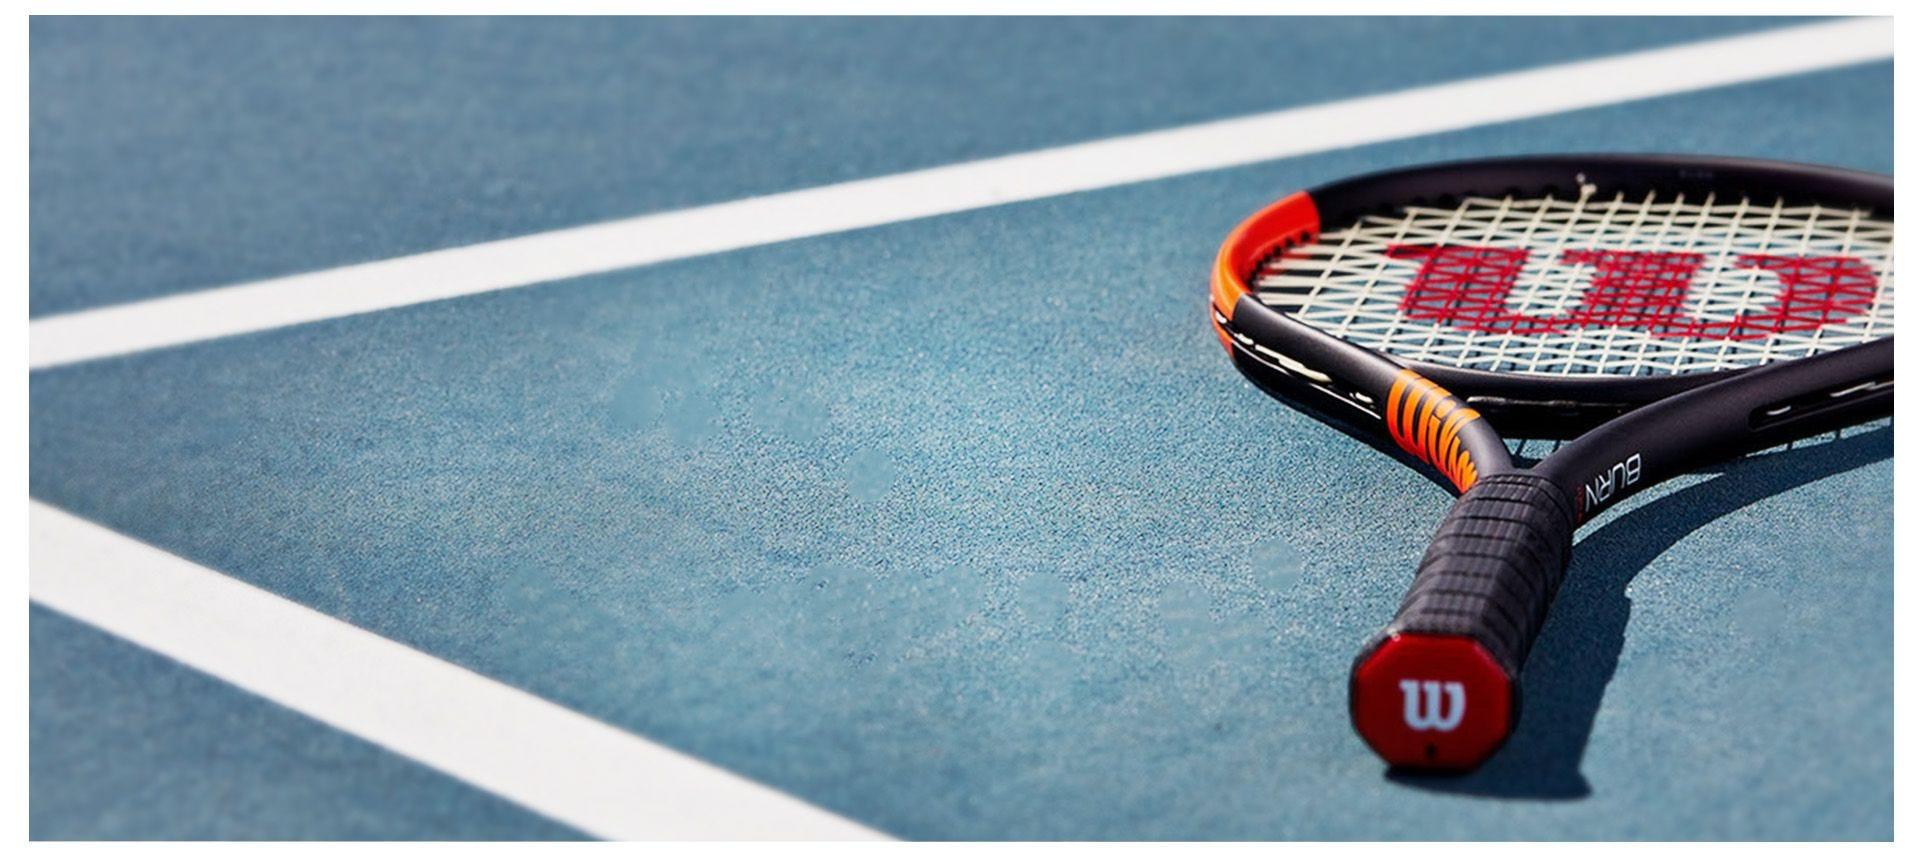 Burn racket on the tennis court